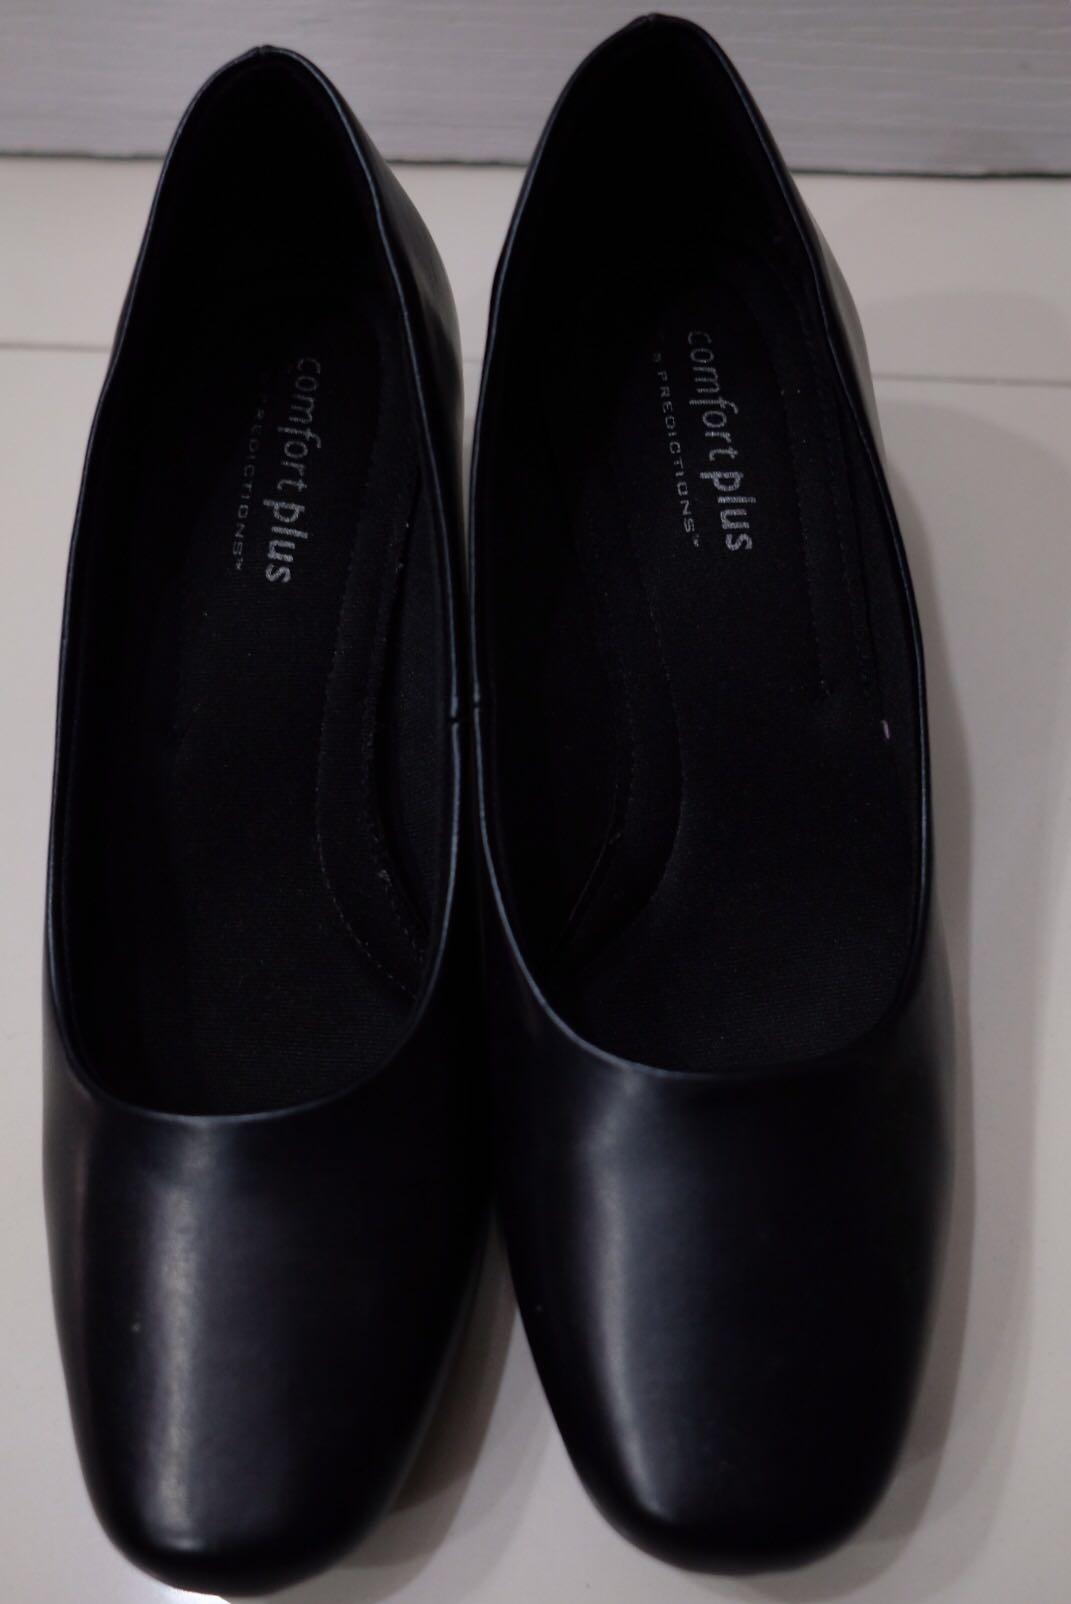 Payless Comfort Plus Black Shoes, Women